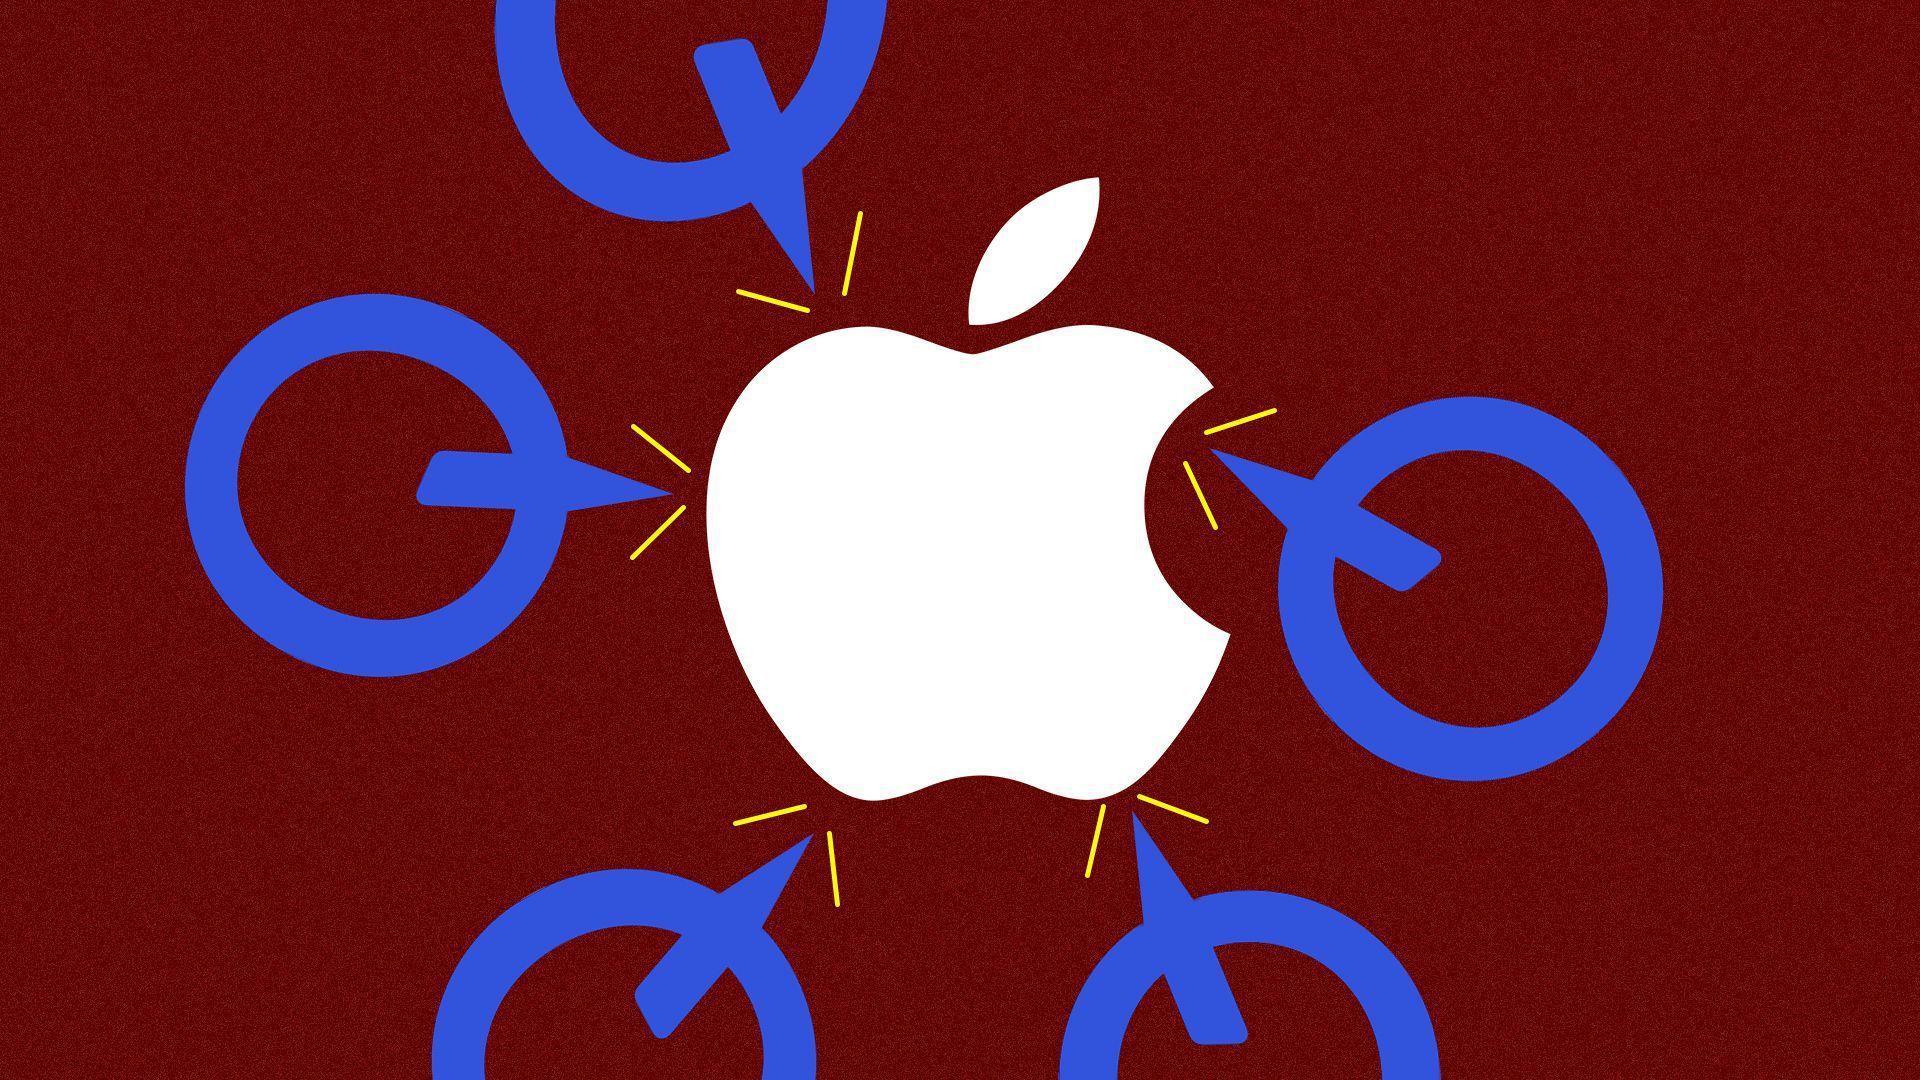 Multiple Qualcomm logos casting arrows at an Apple logo